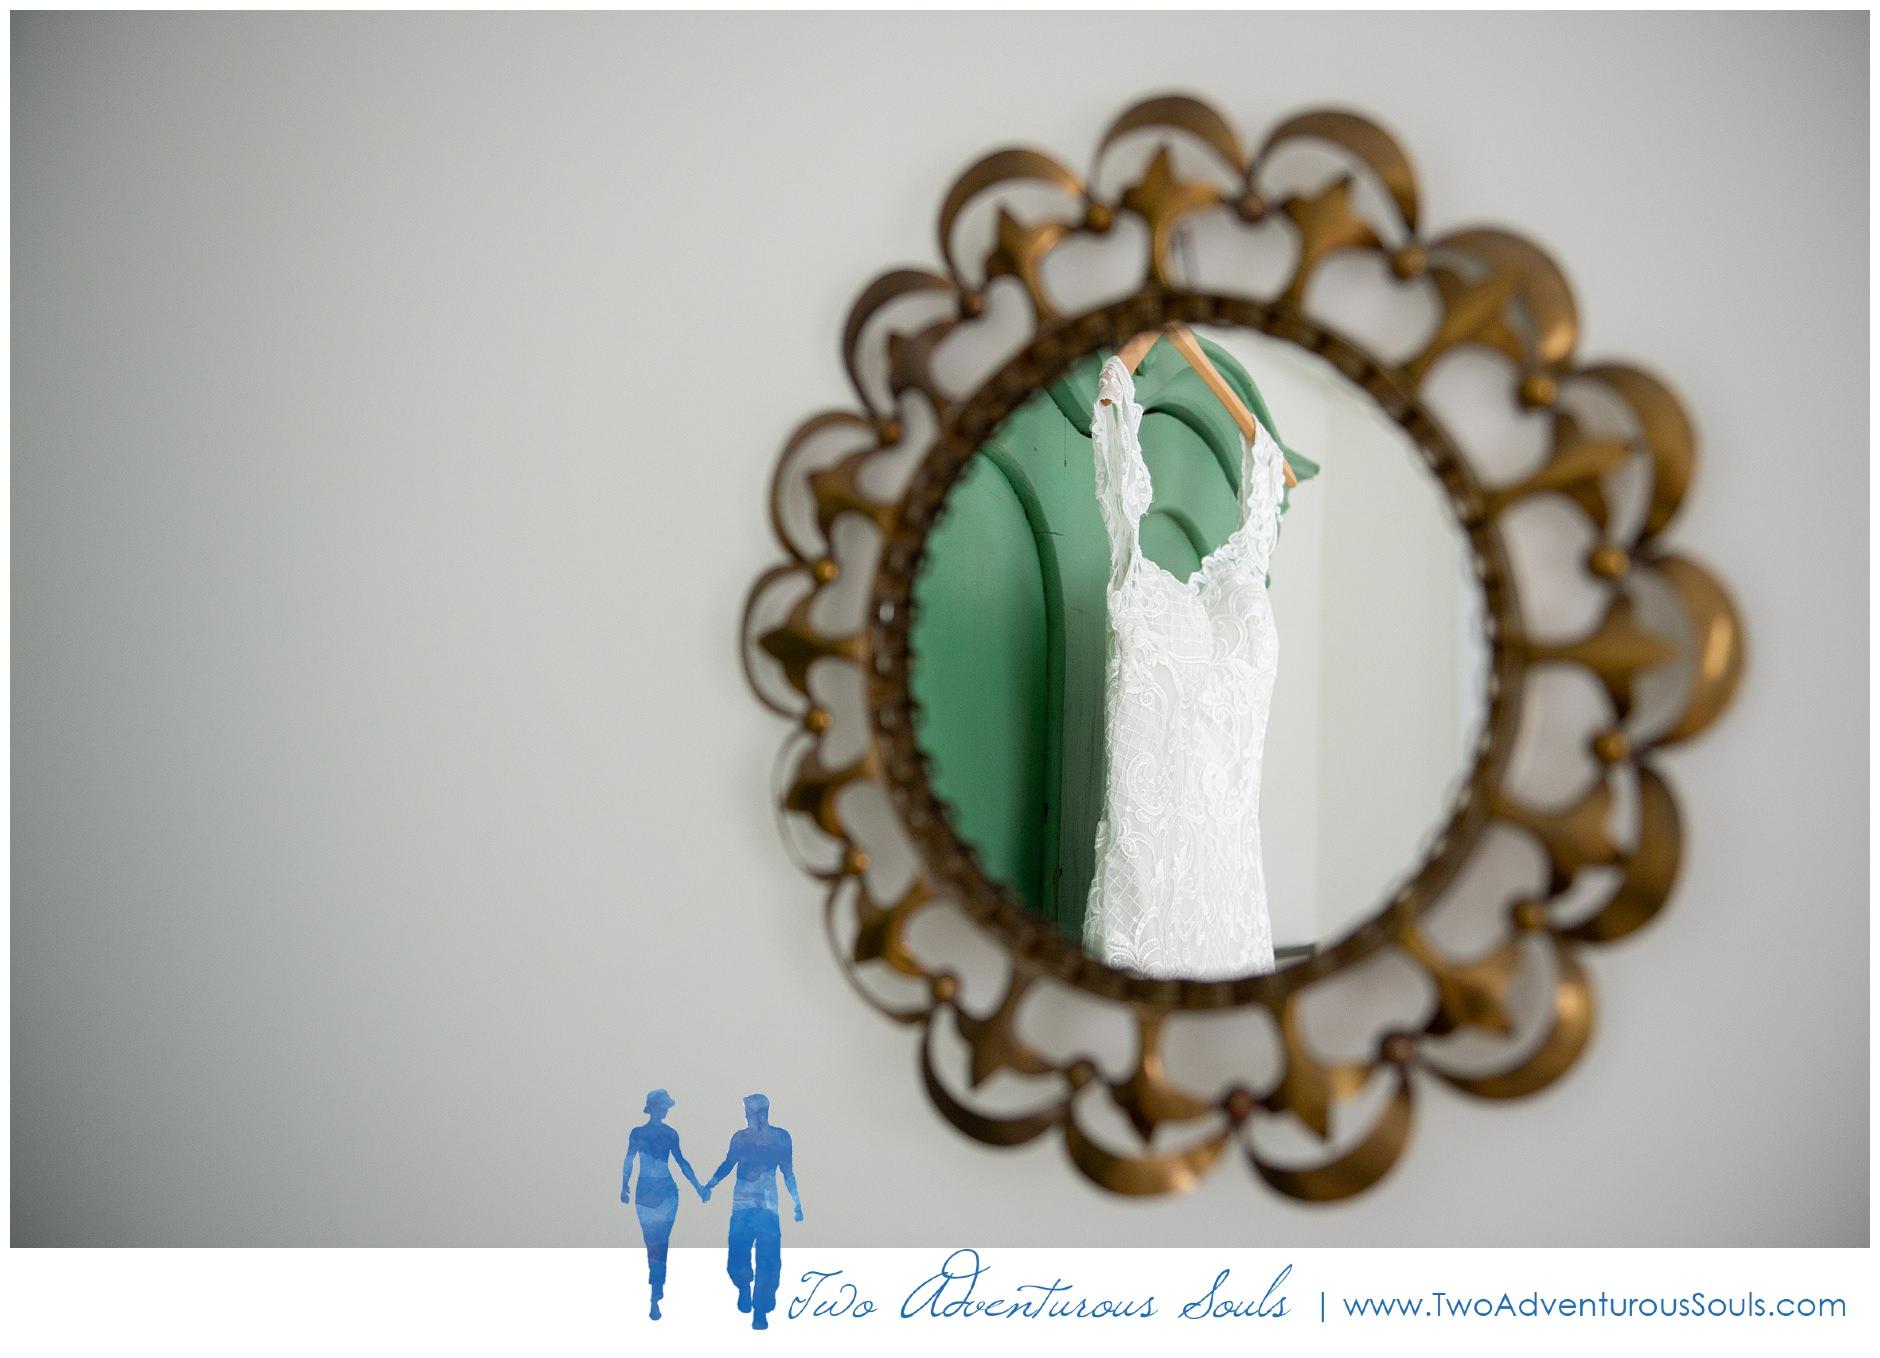 Chebeague Island Inn Wedding Photograpehrs, Maine Wedding Photographers, Two Adventurous Souls-082419_0002.jpg